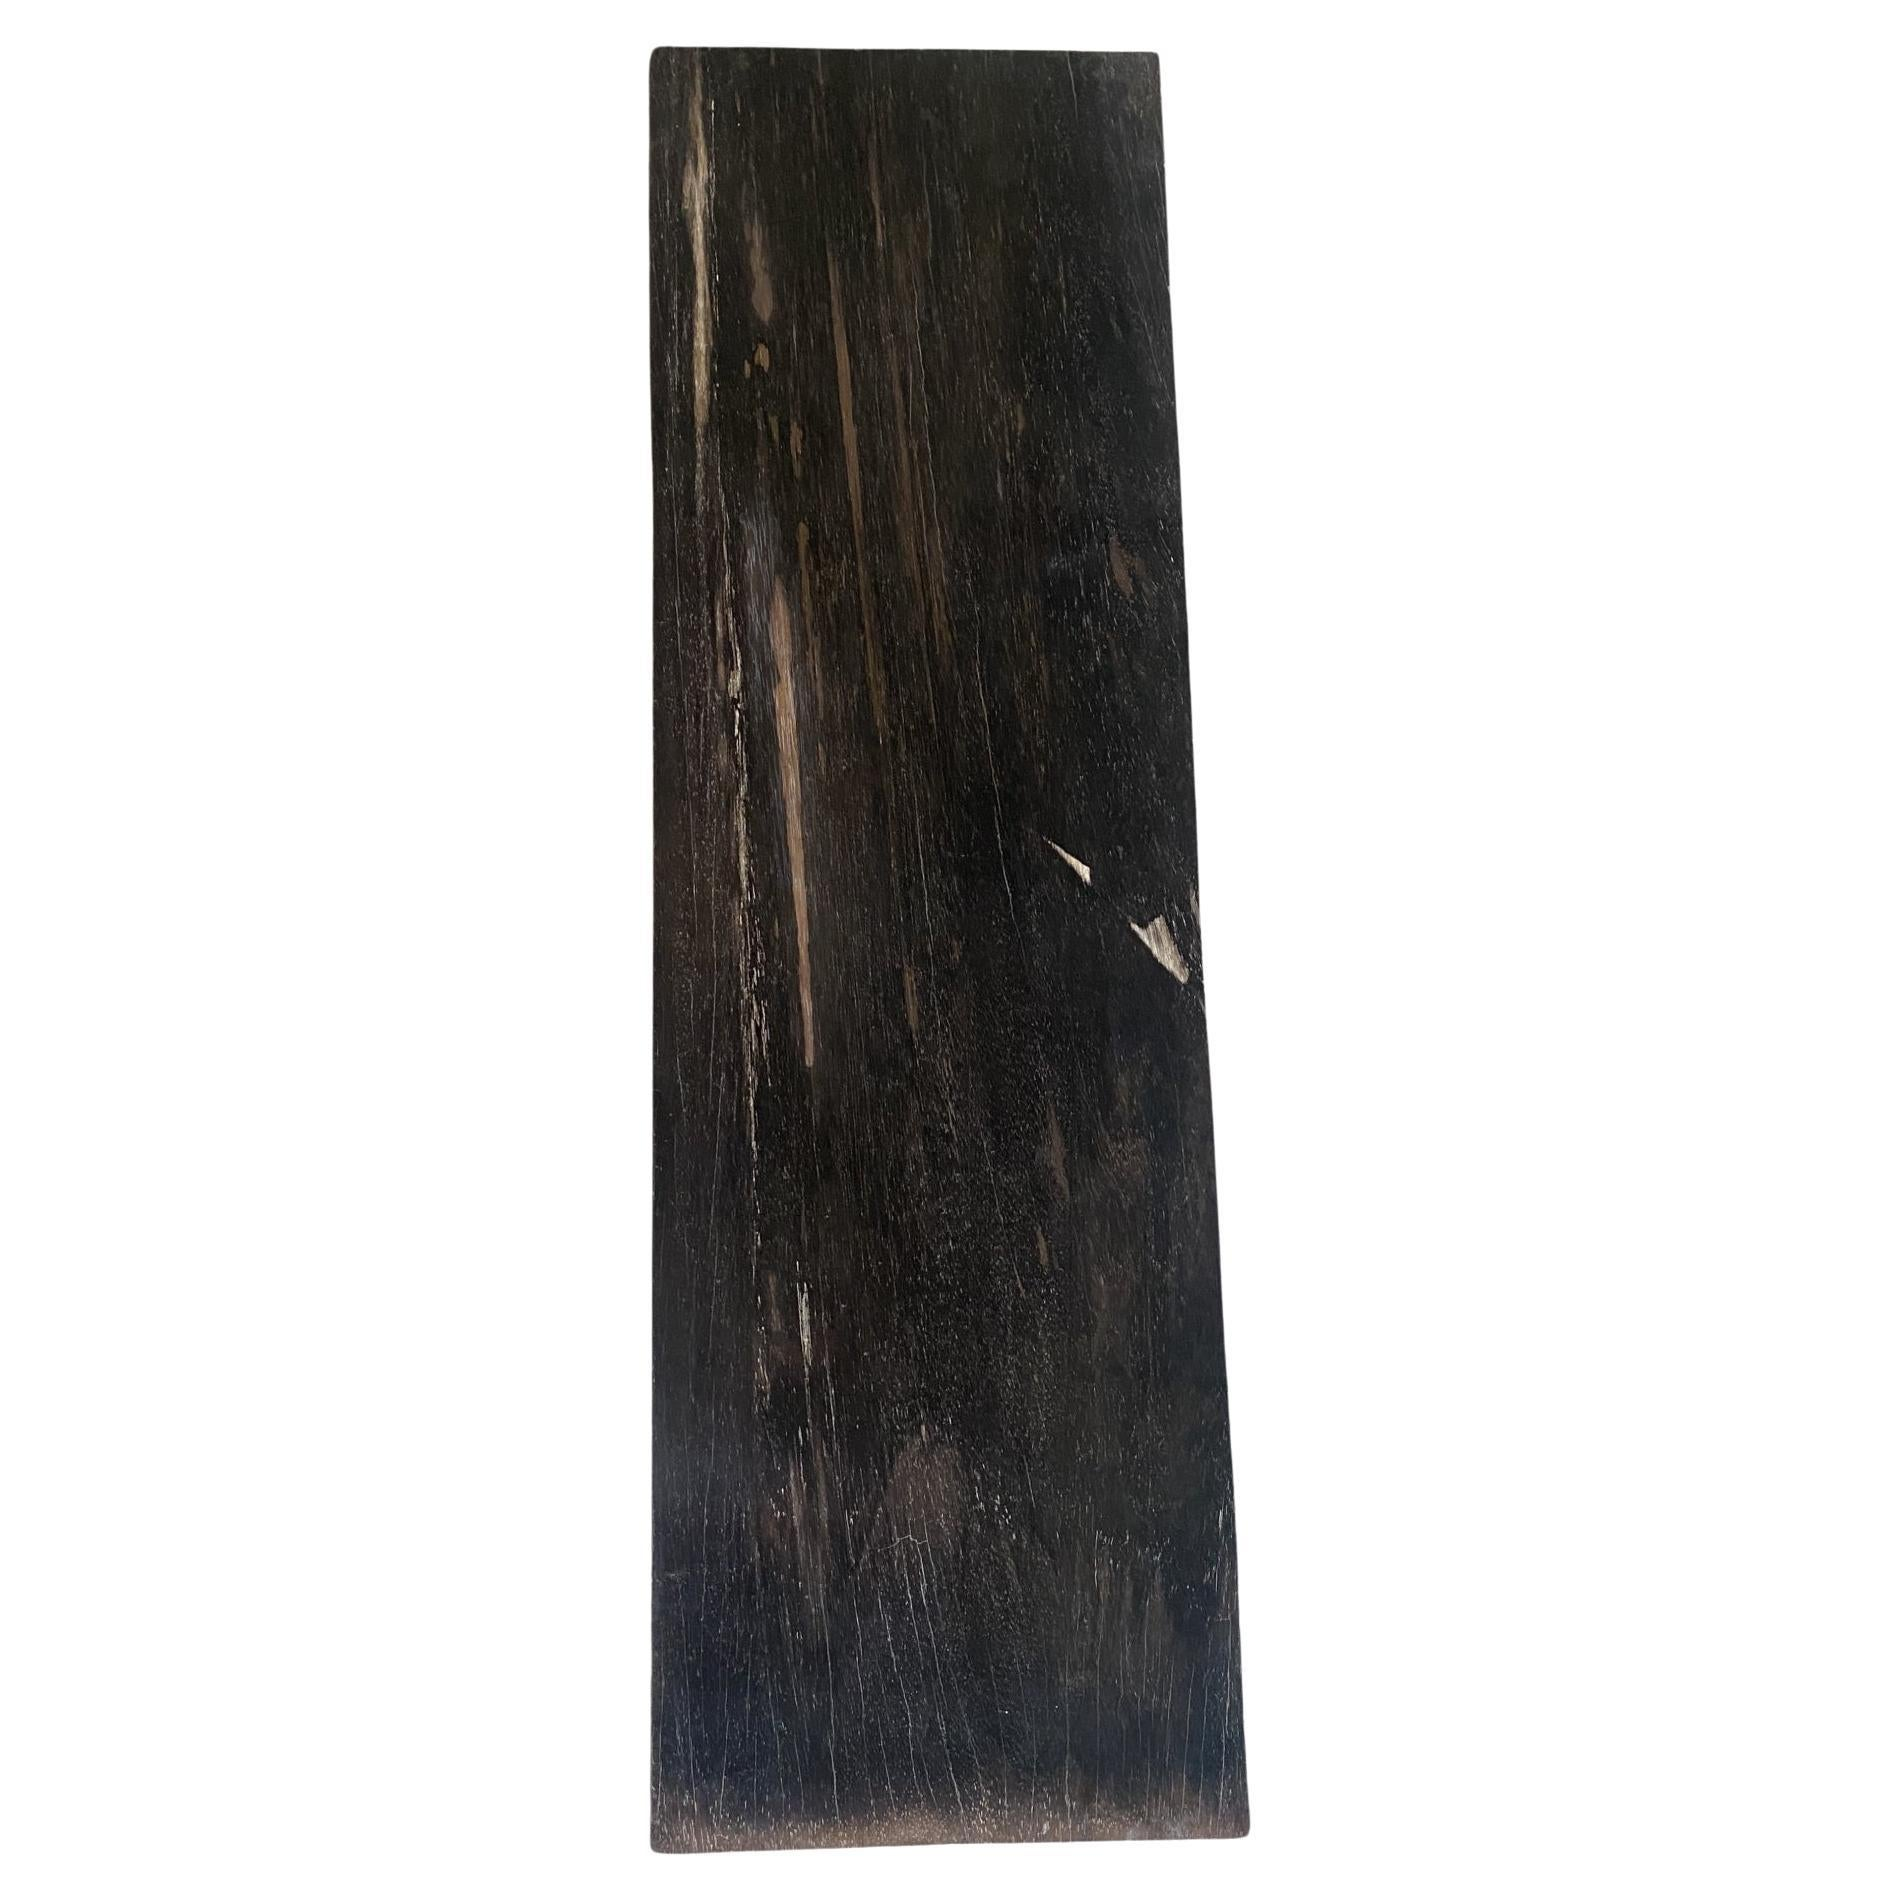 Unique Wood Console by DeepWood